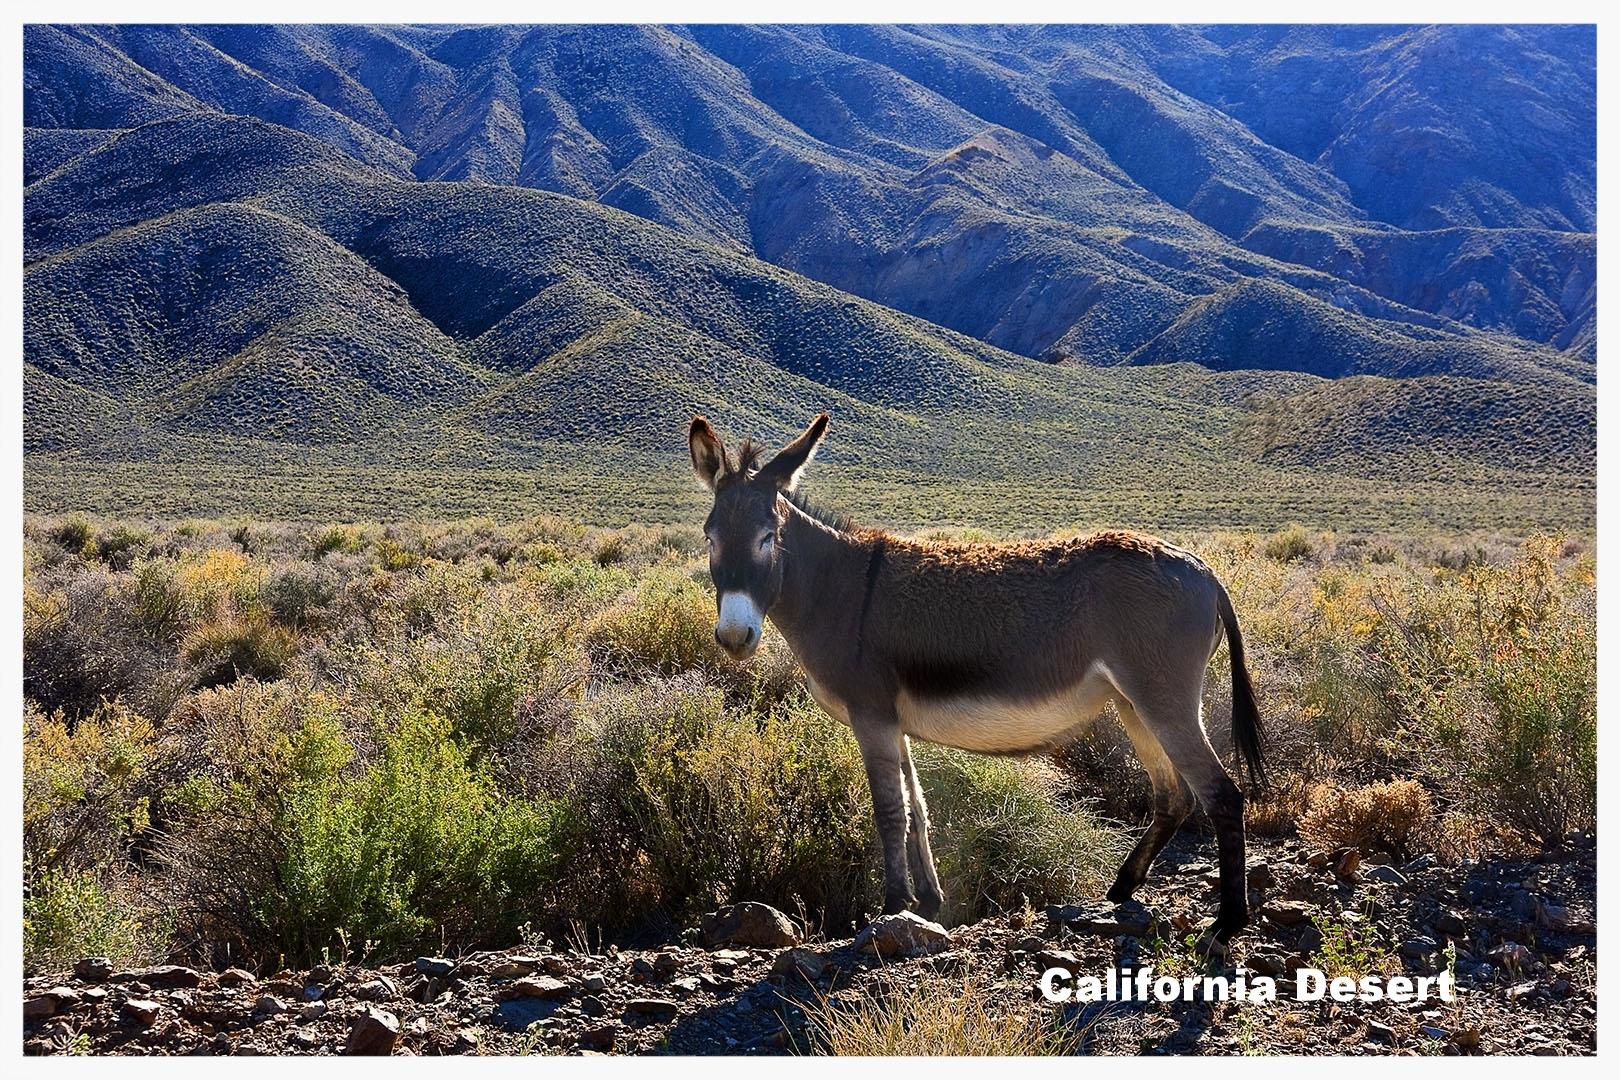 Click to view California Desert Portfolio